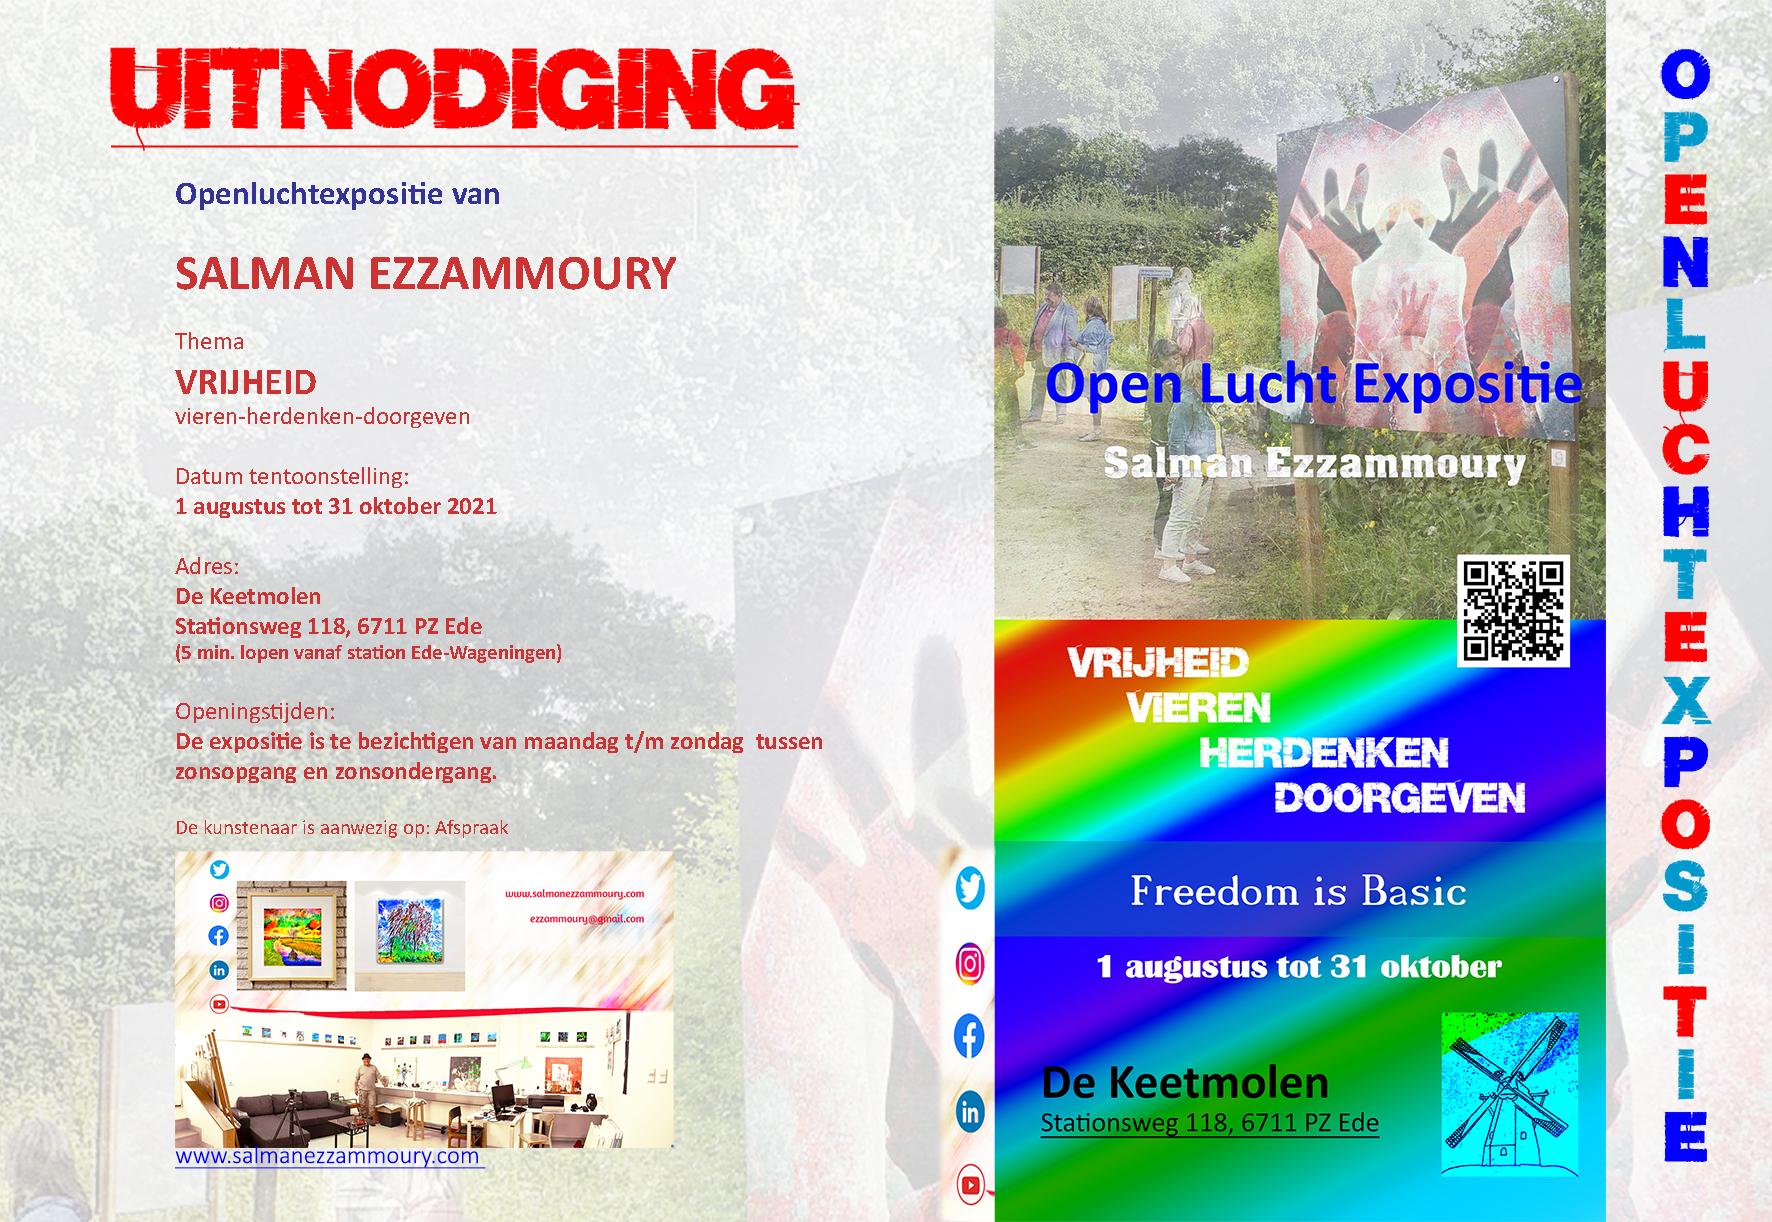 Uitnodiging expo vrijheid